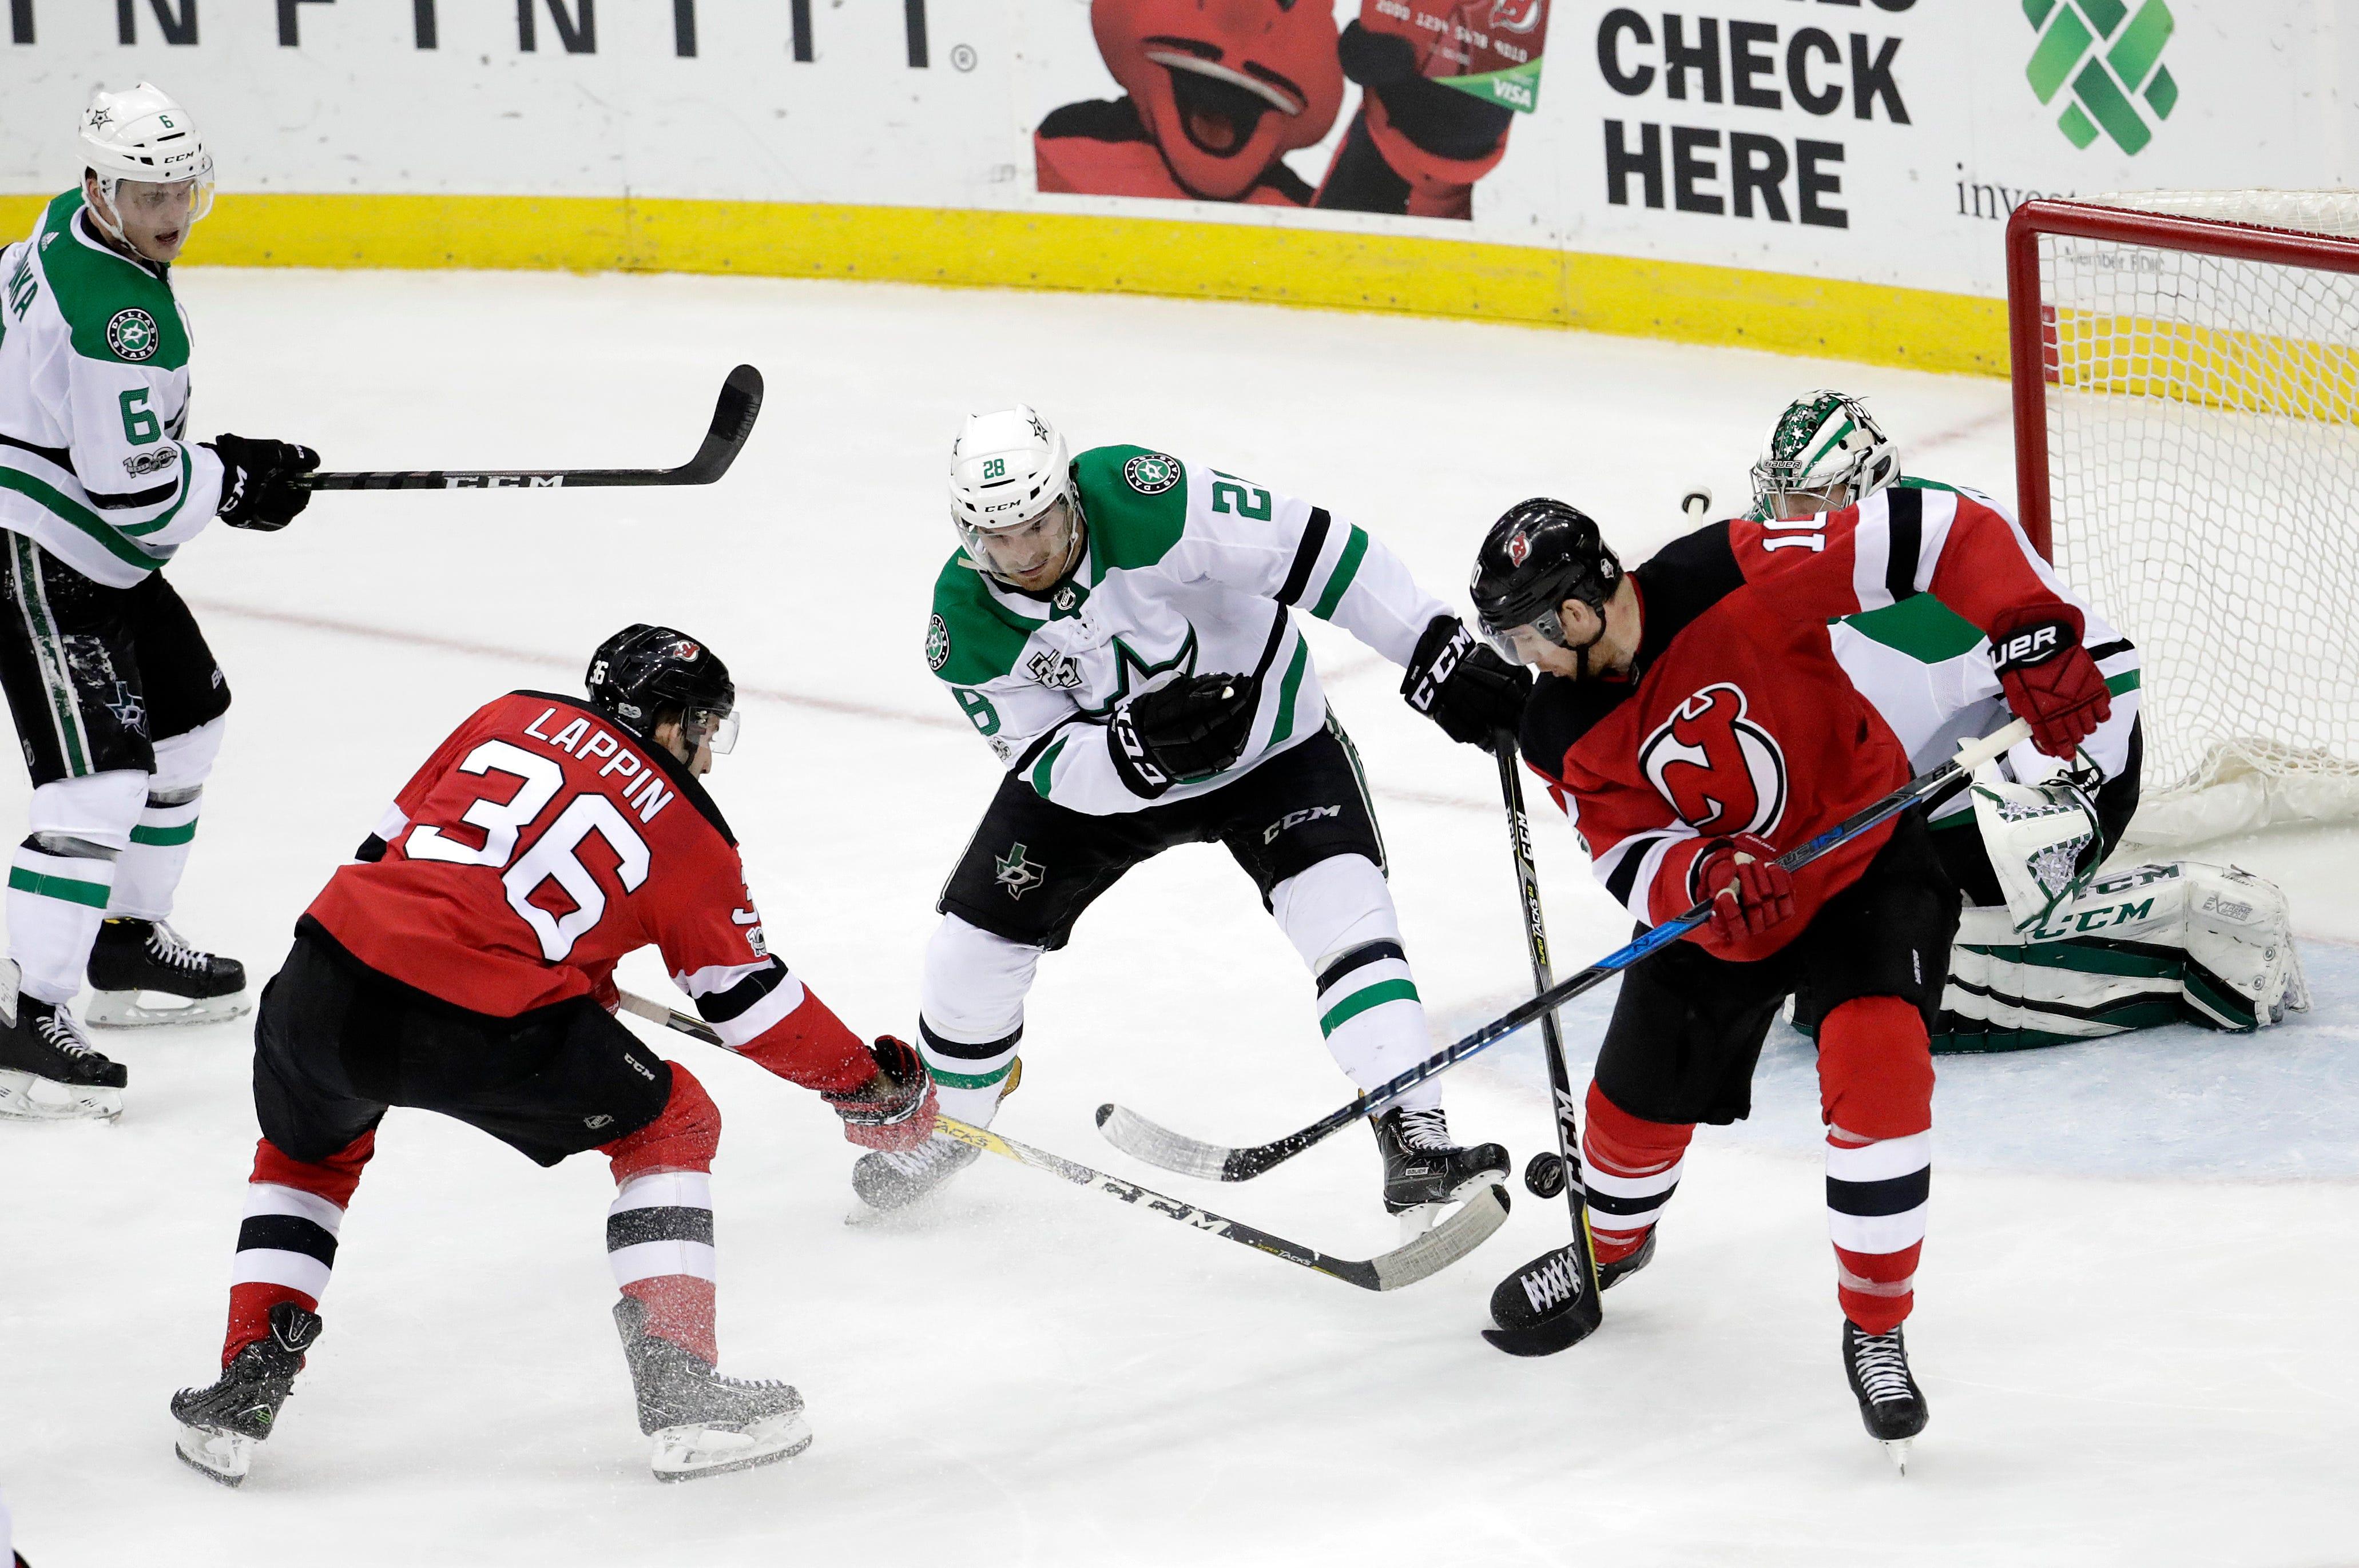 Brian Boyle scores twice to help Devils beat Stars 5-2.